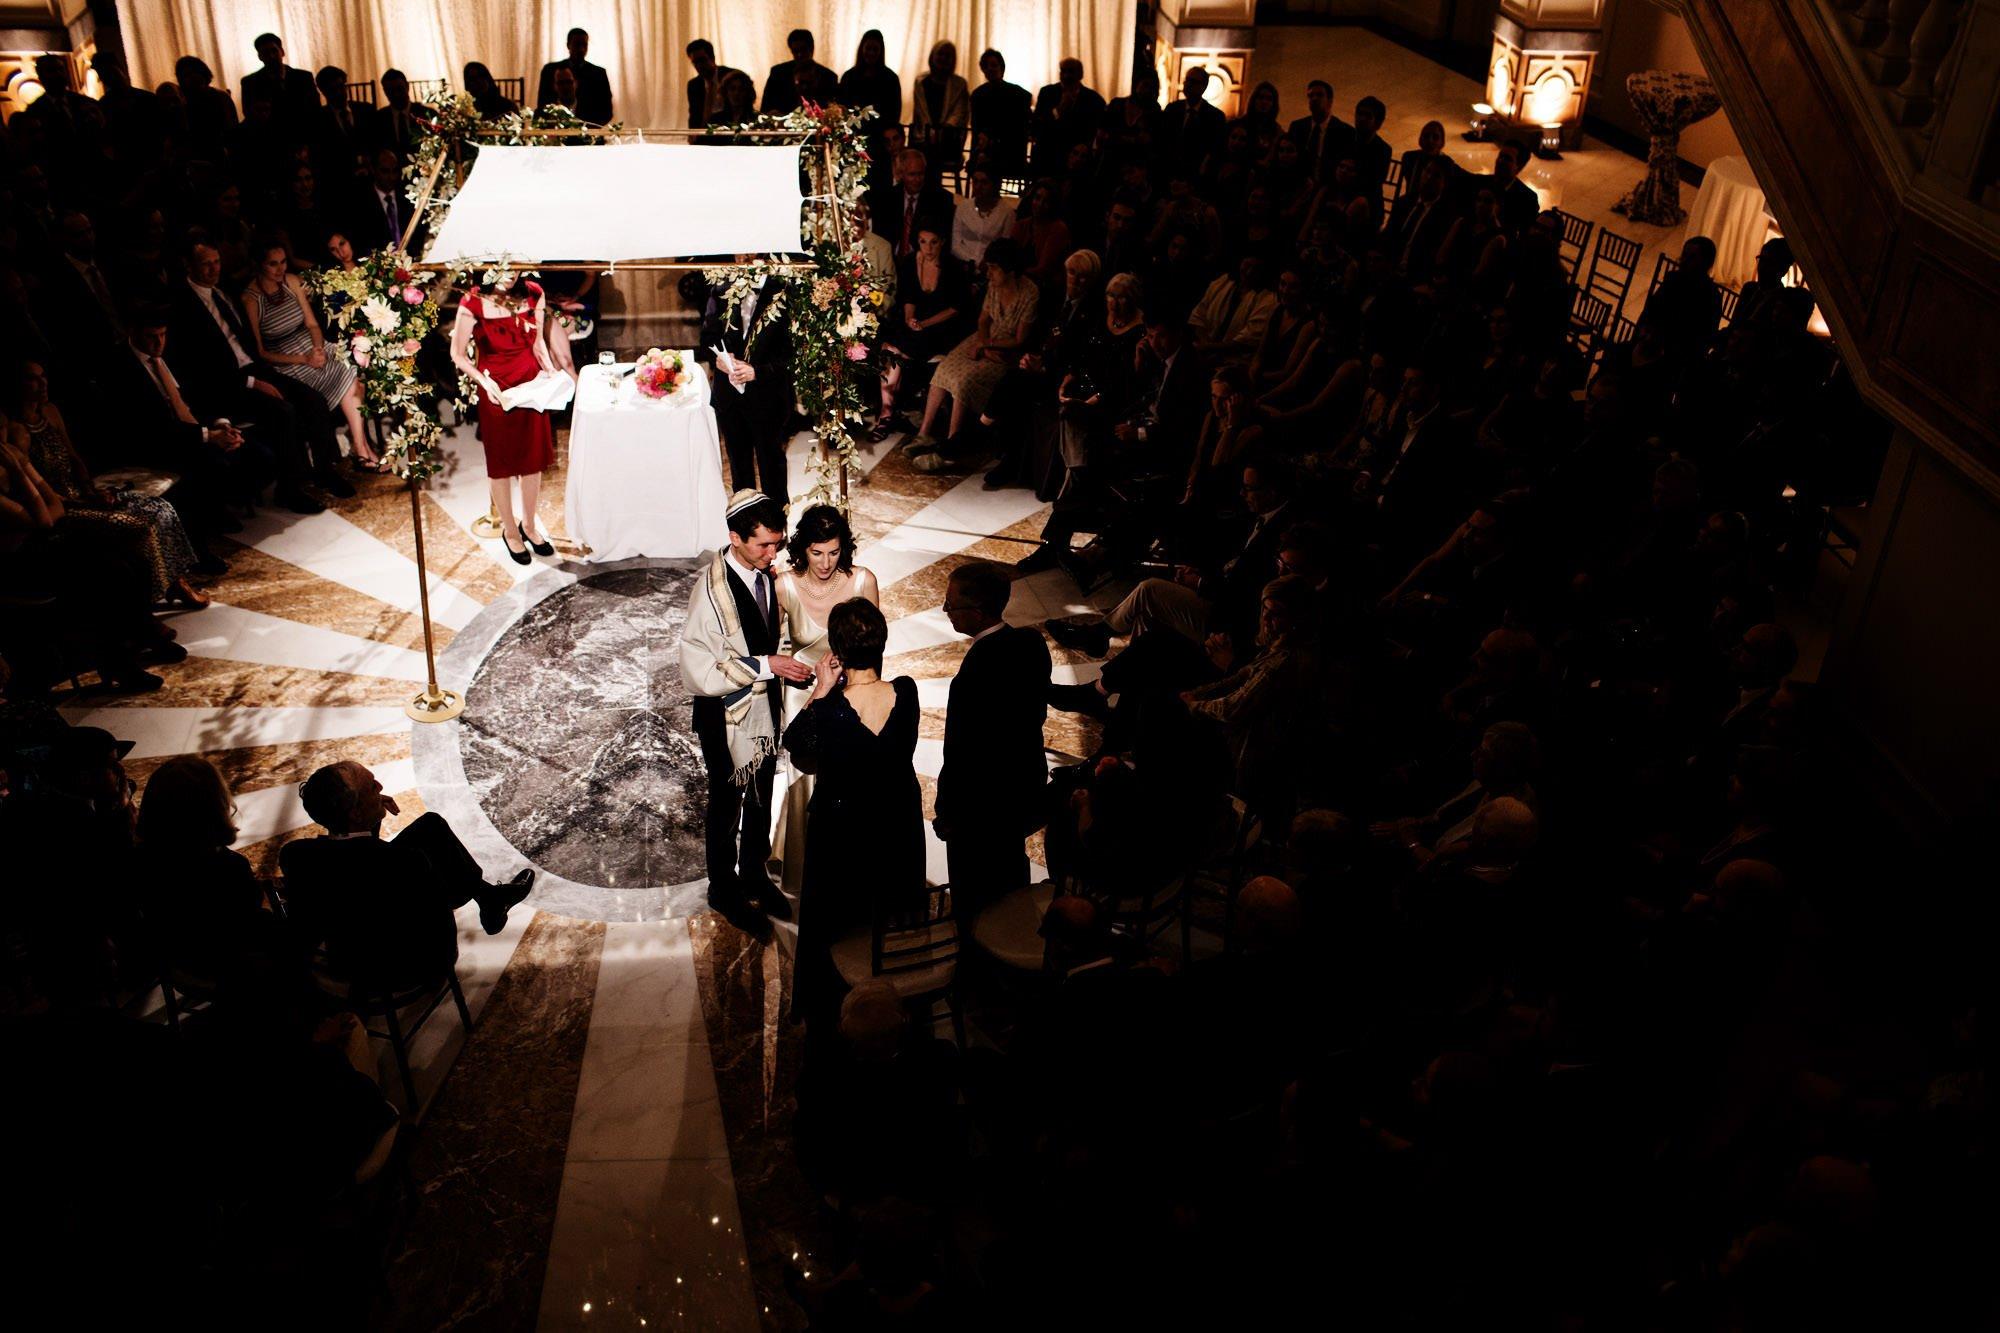 A Jewish wedding ceremony at NMWA.